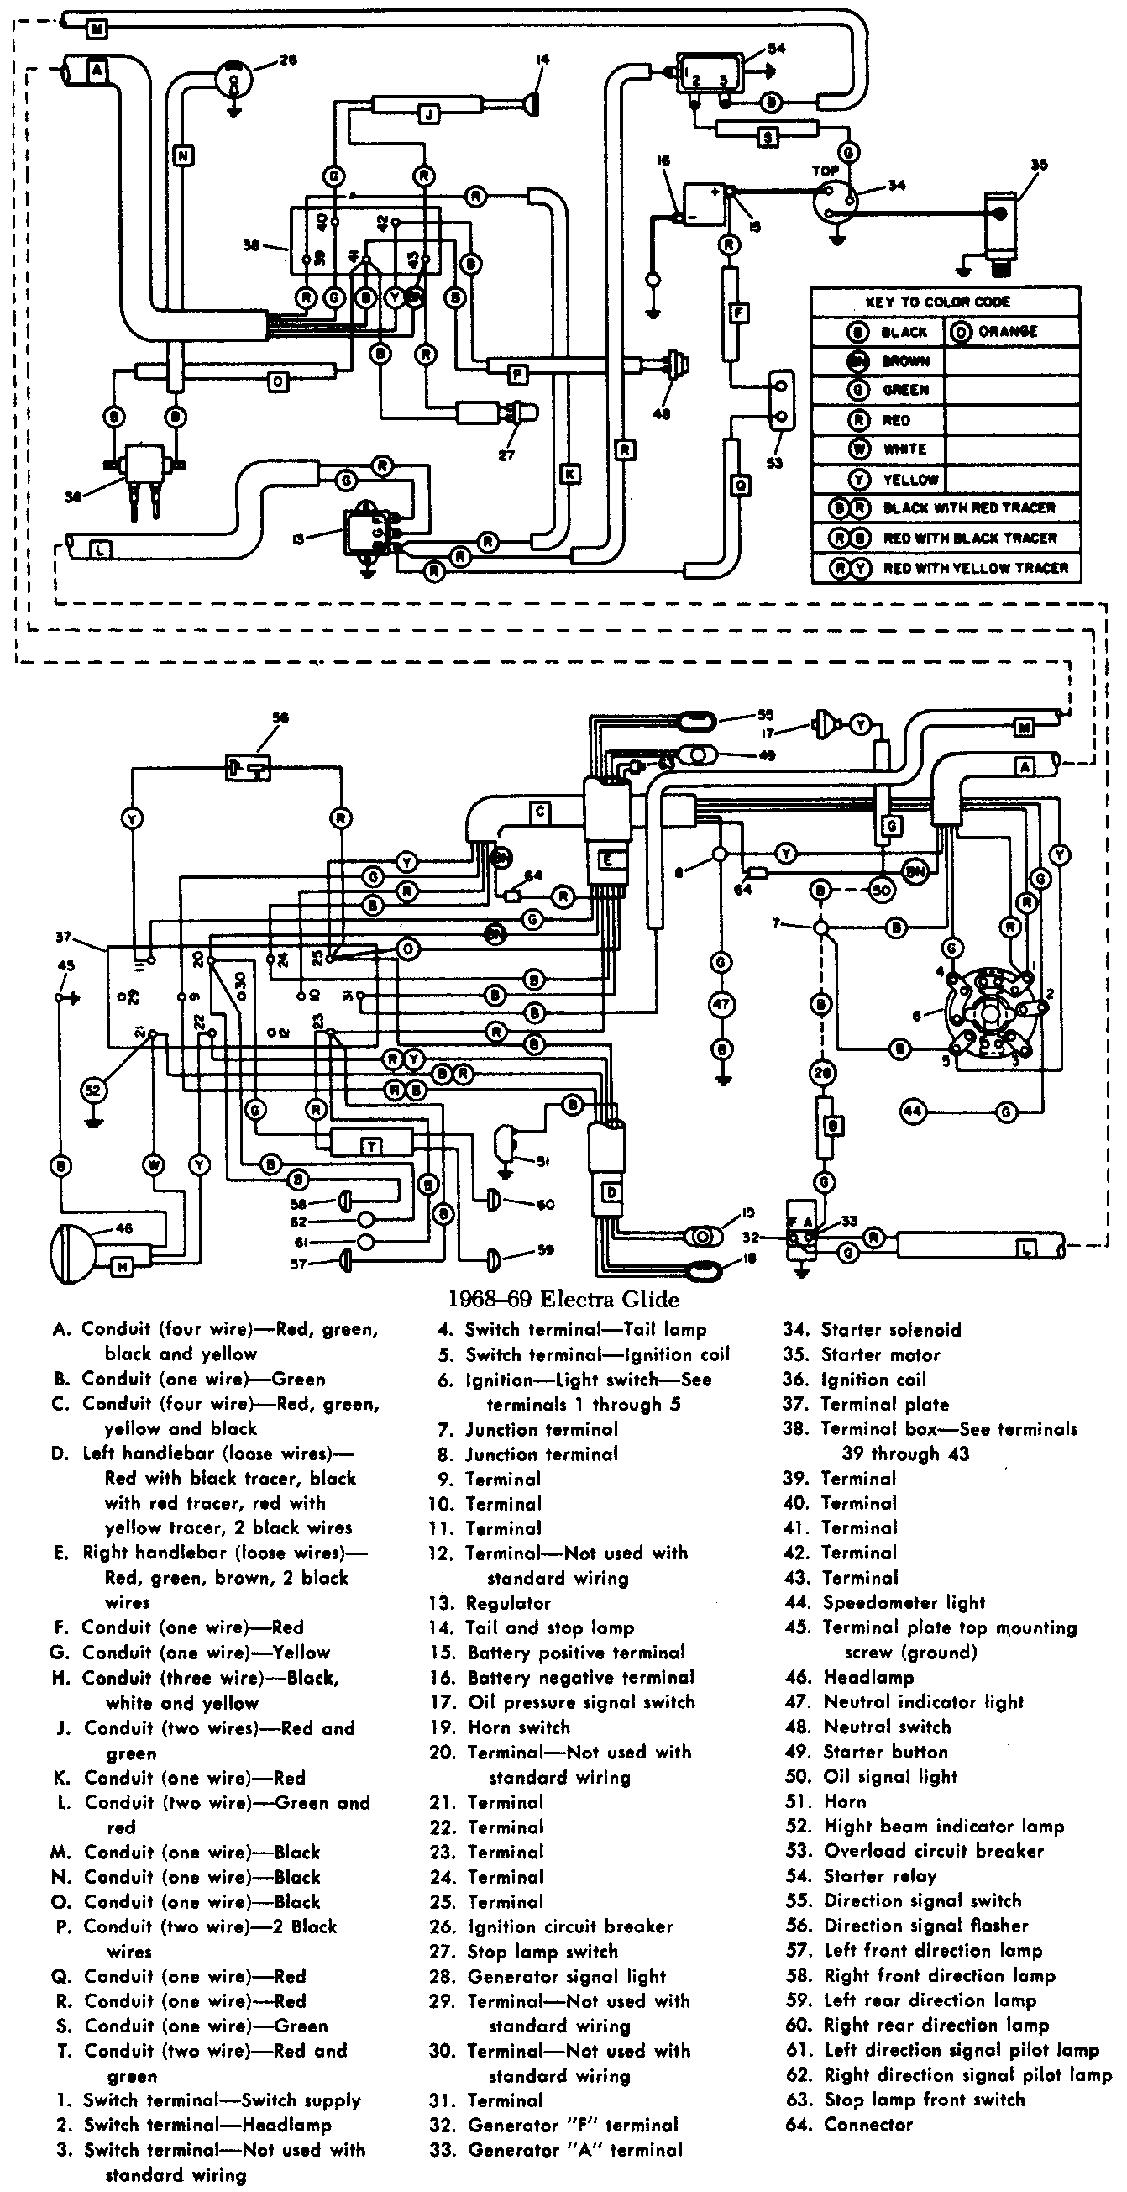 1968 69electra gif